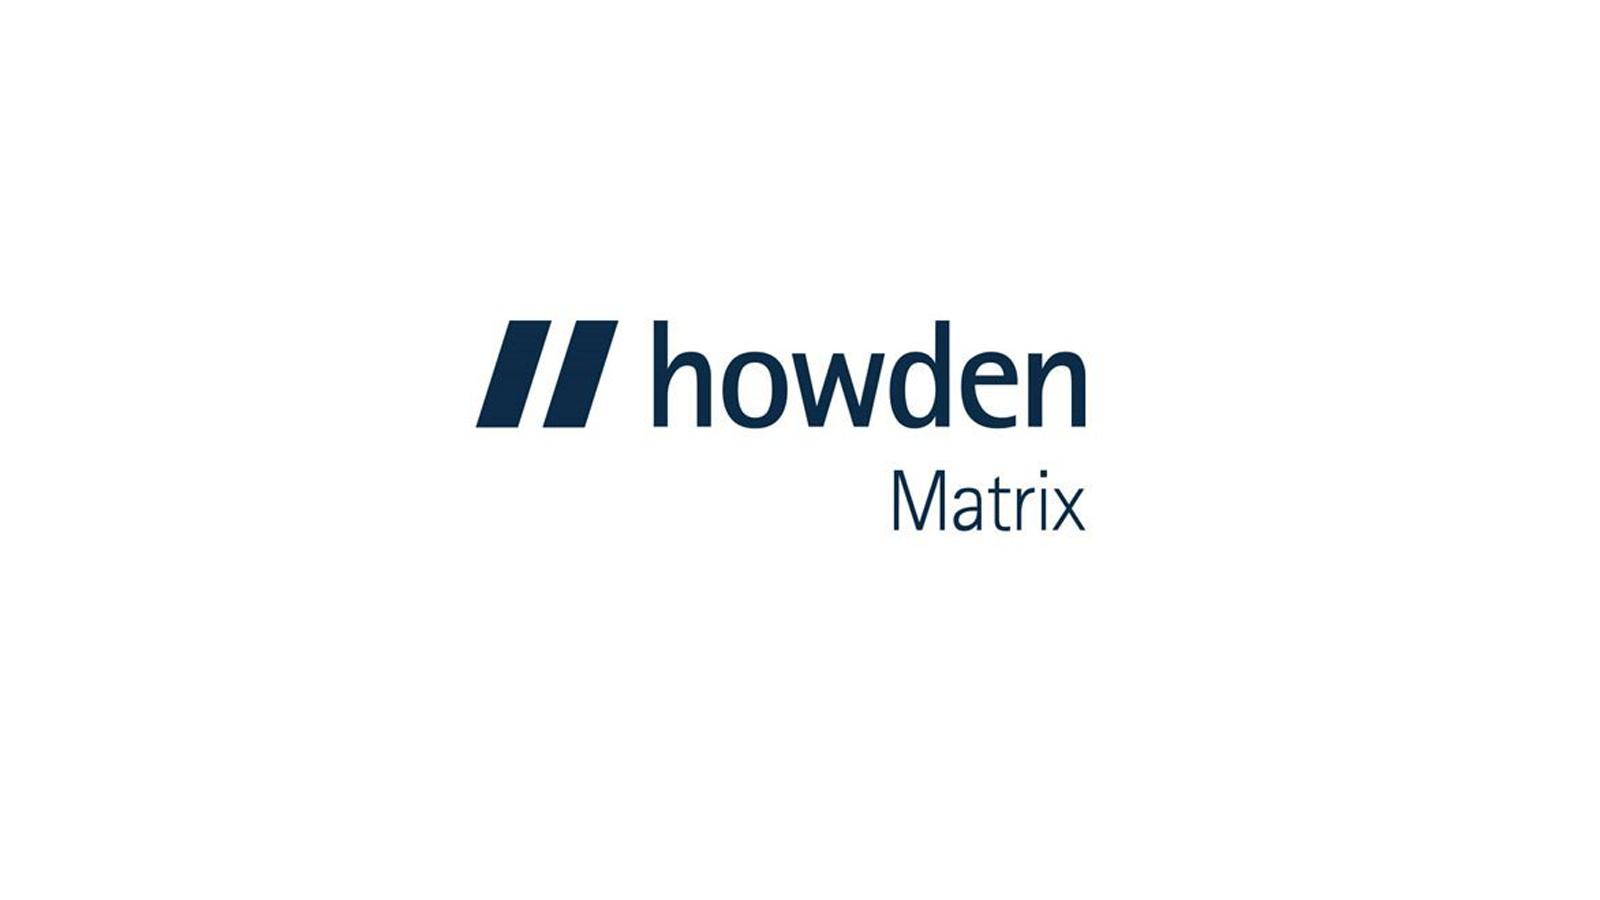 howden Matrix logo